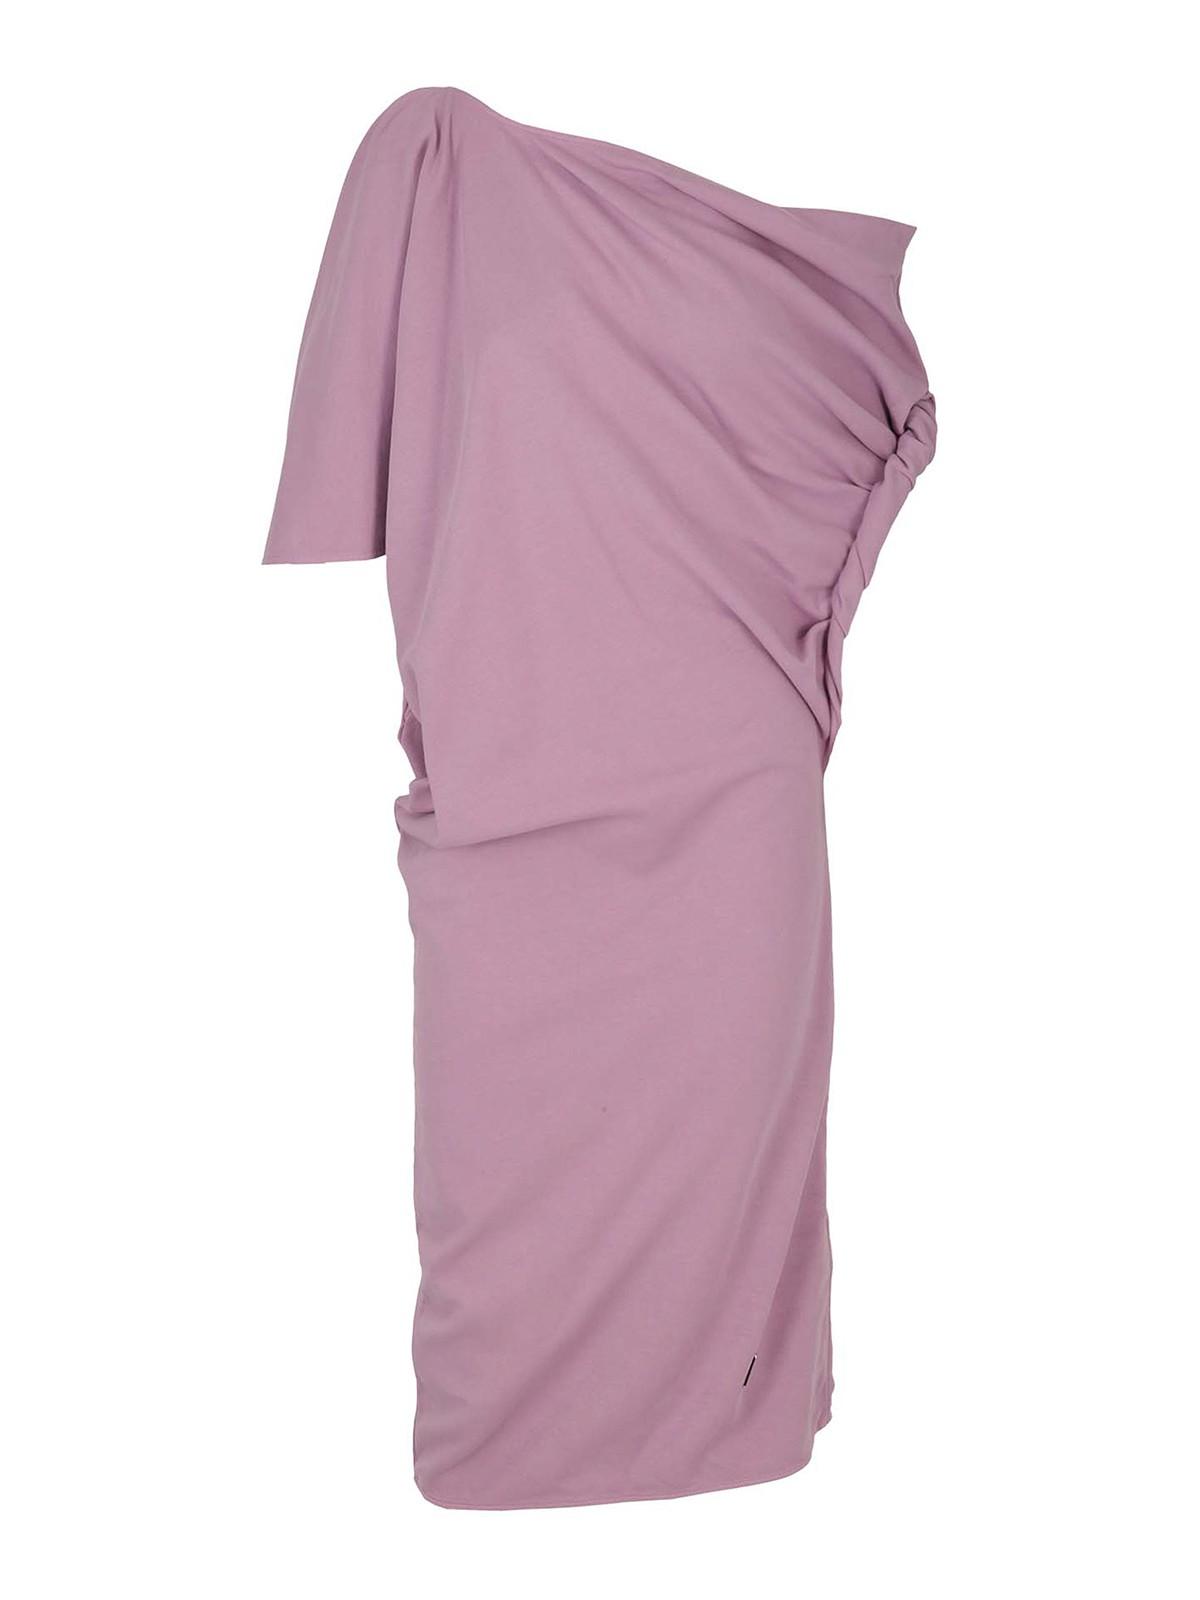 Attico Cottons JERSEY ASYMMETRIC T DRESS